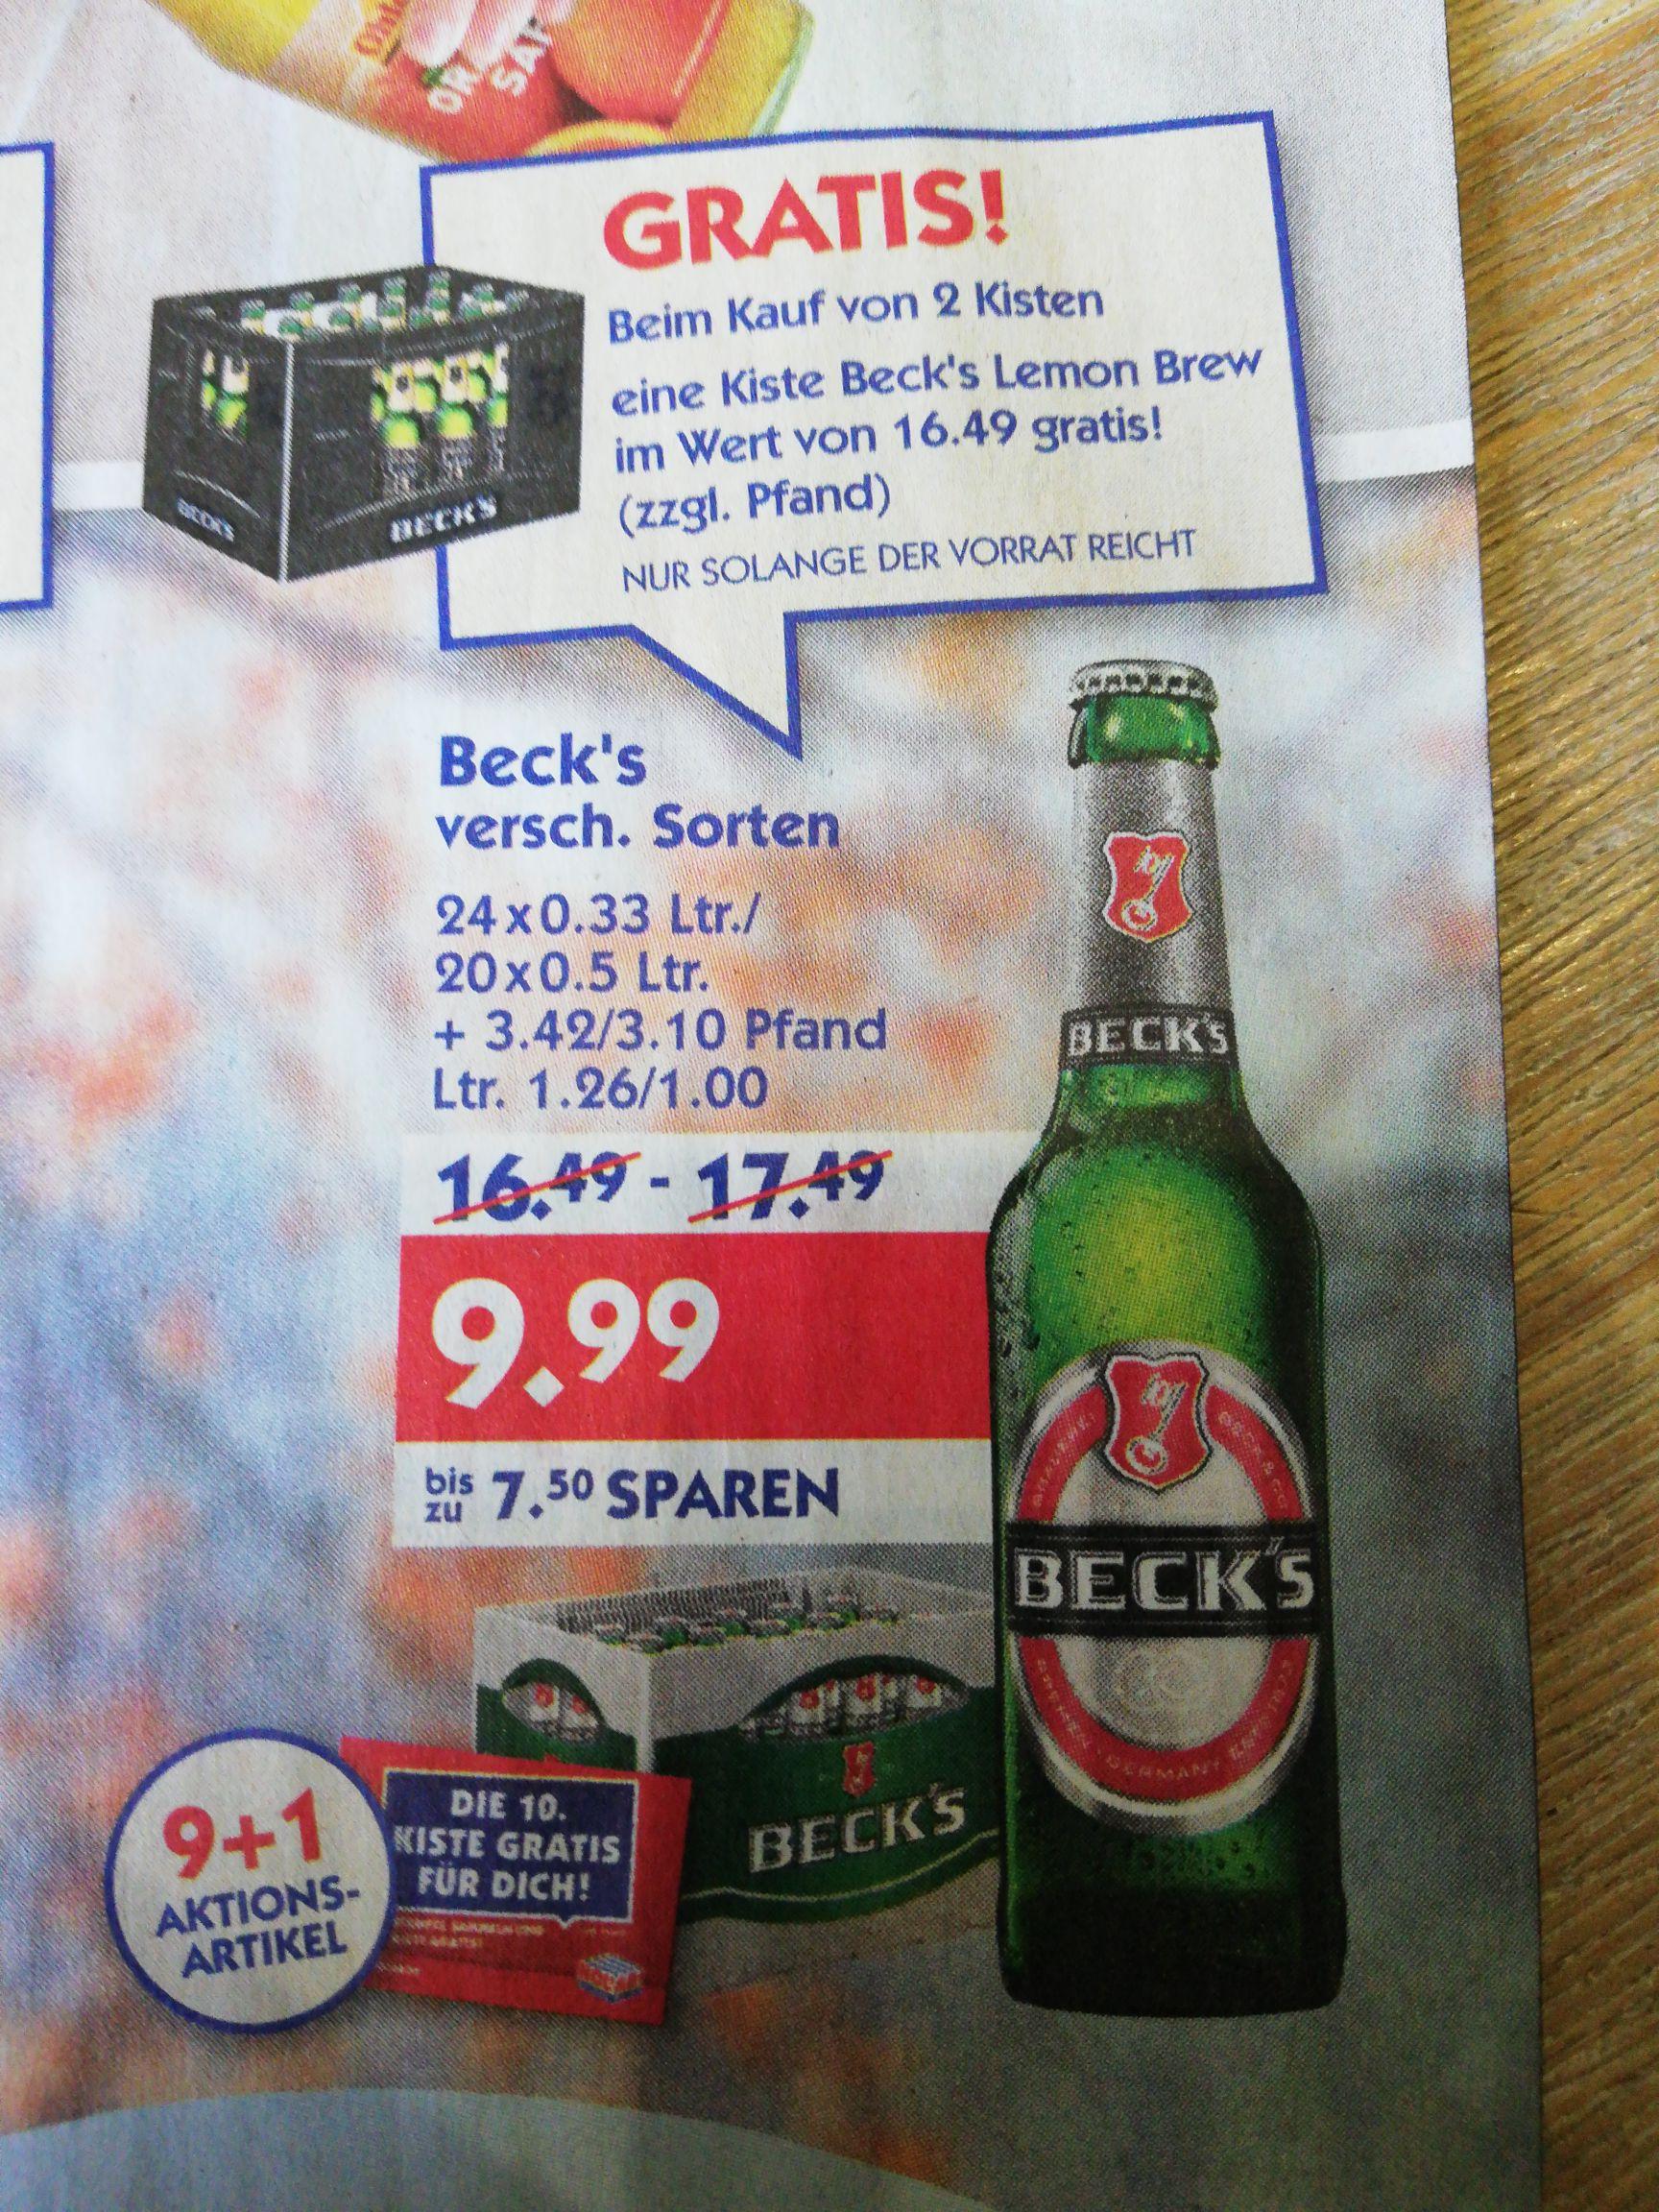 2 Kisten Beck's + Gratis Kiste Beck's Lemon Brew zzgl. Pfand